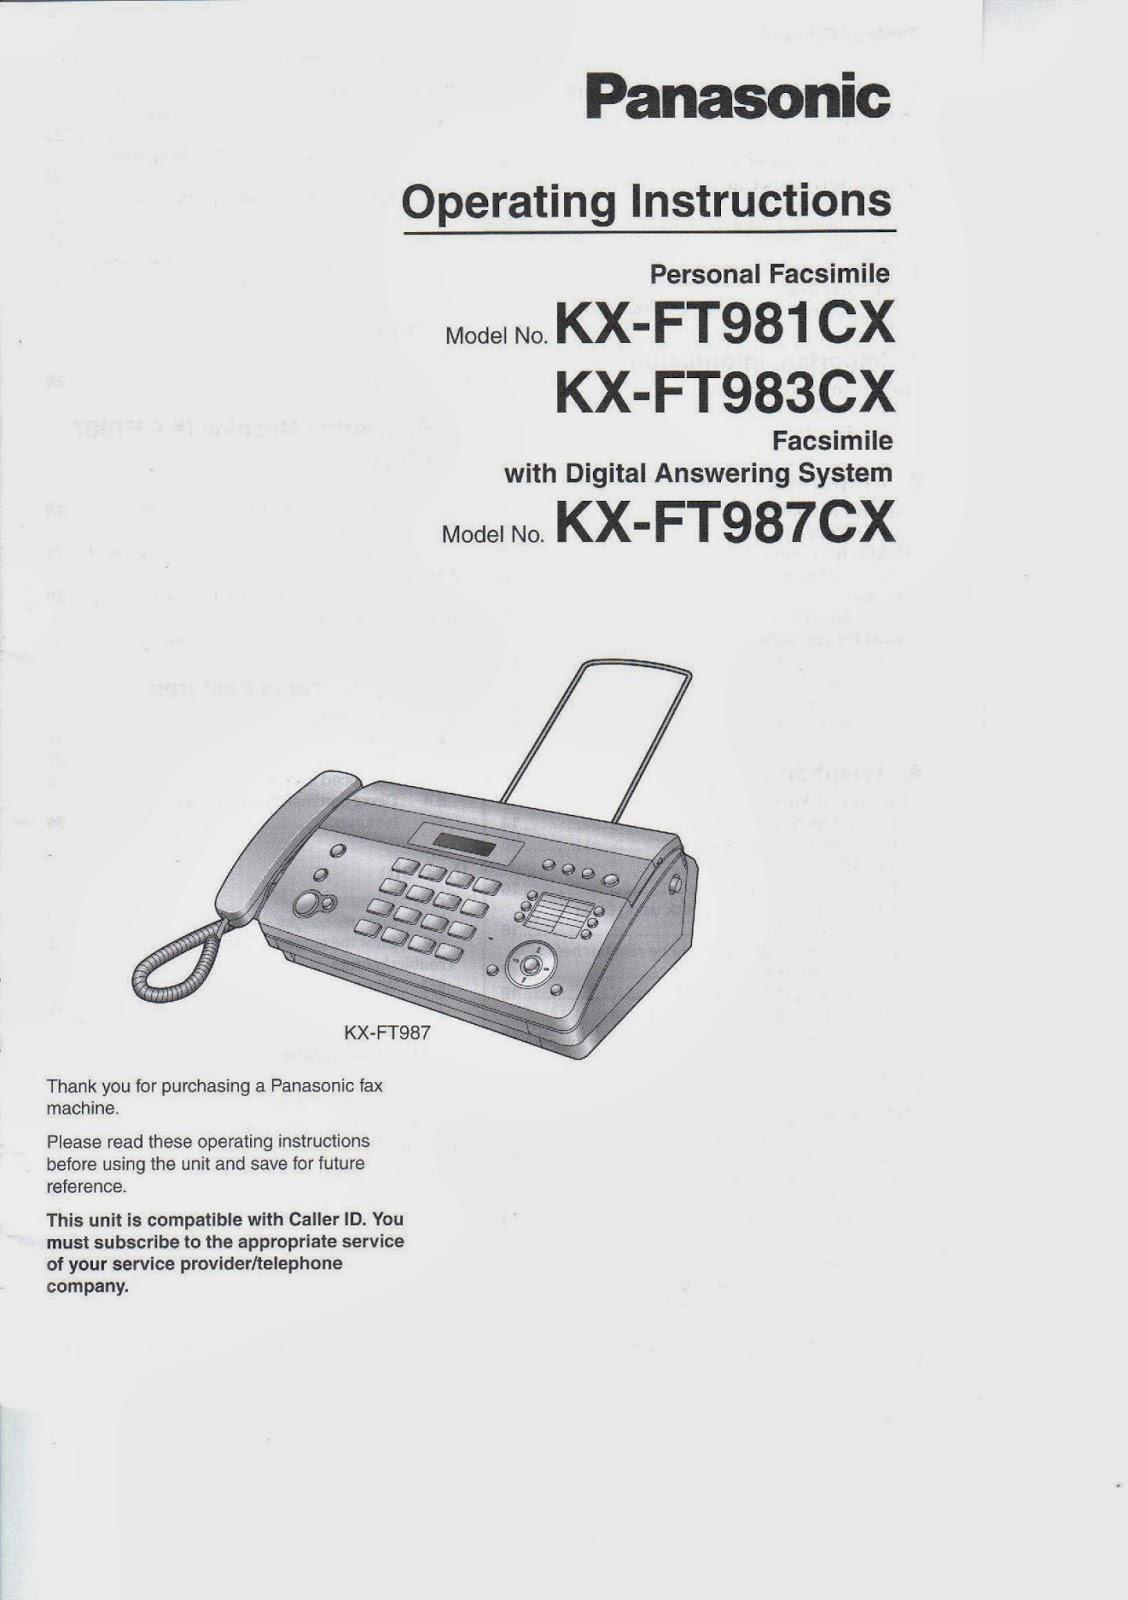 Jual Murah Panasonic Kx Ft 981 Fax Termurah 2018 Machine Ft987cx Facsimile Copy Telephone Answering System Program Telepon Manual Ft981 Ft983 Ft987